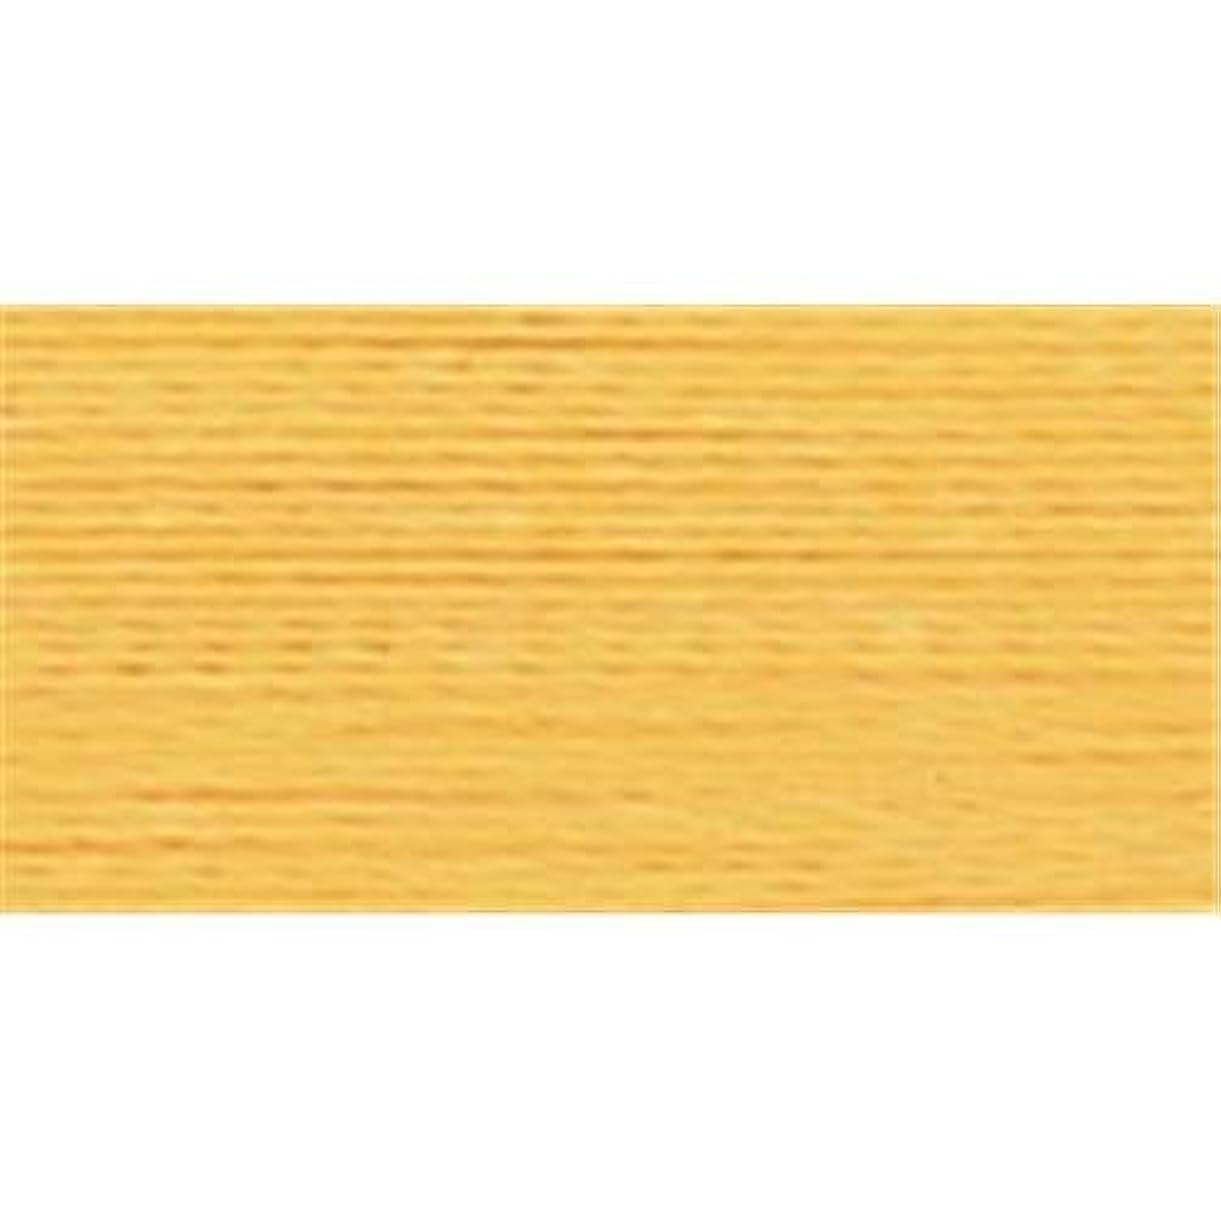 Robison-Anton Rayon Super Strength Thread, 1100-Yard, Brite Yellow qqzar9907